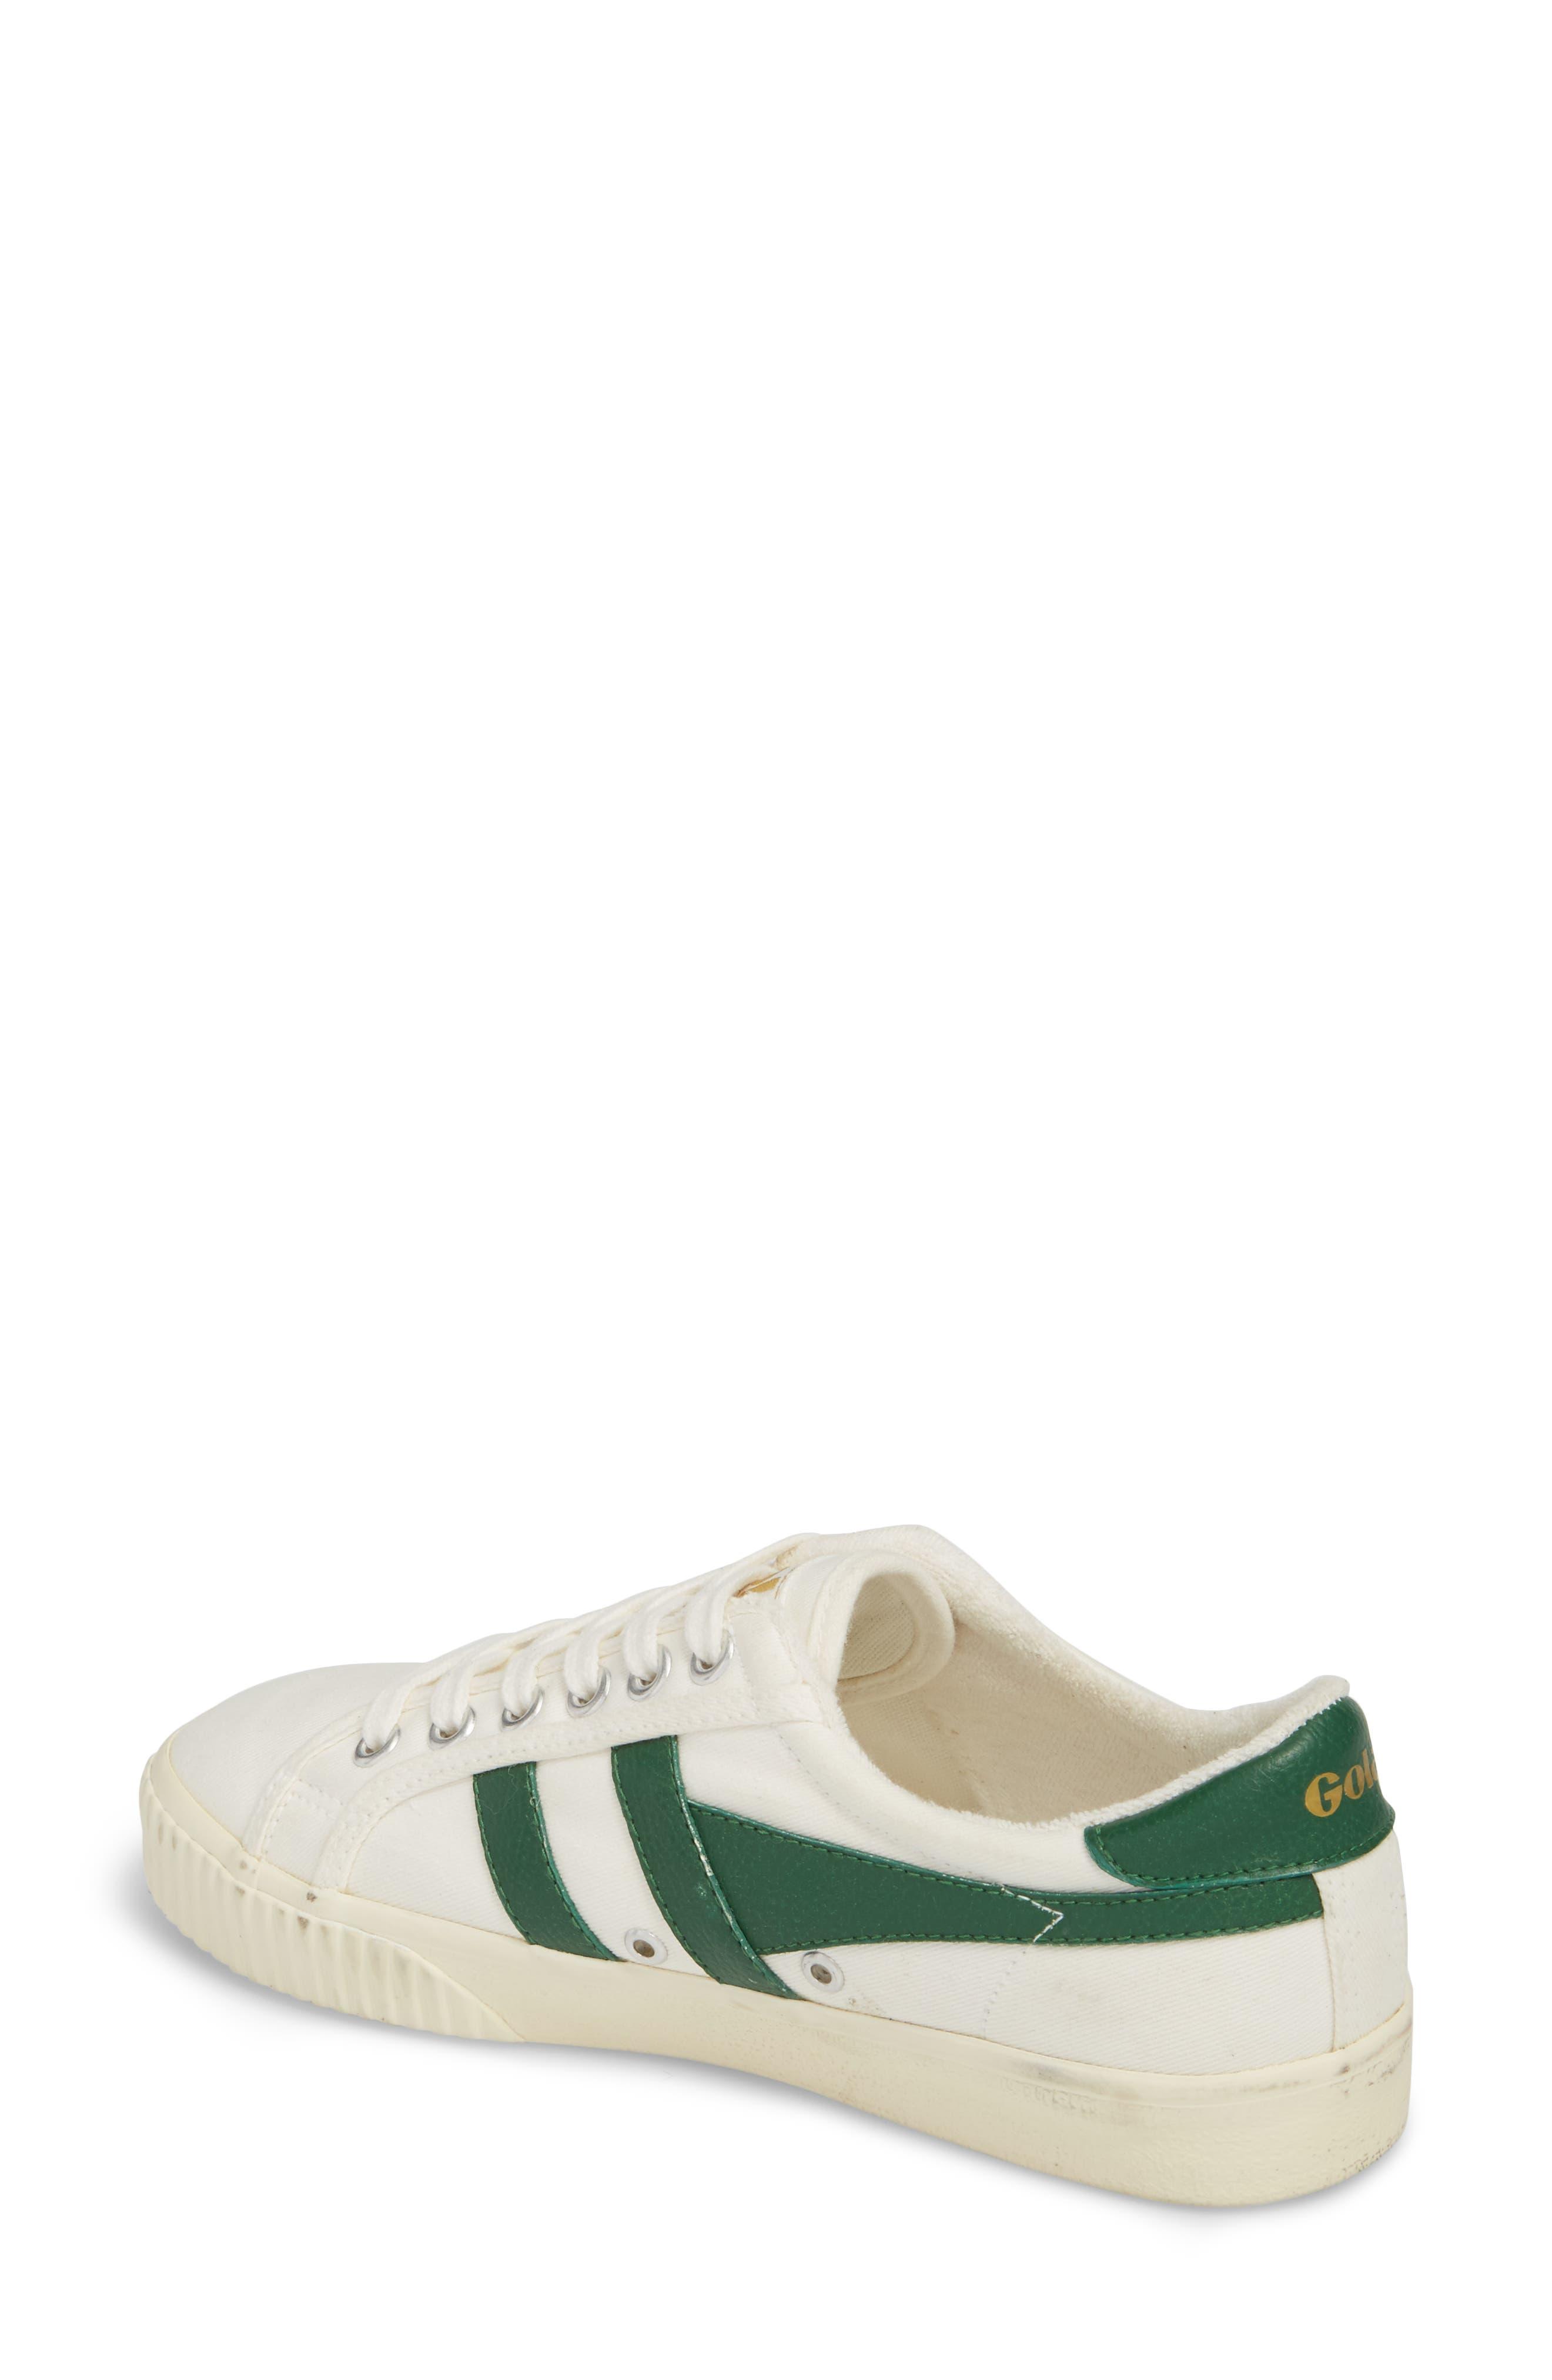 Tennis Mark Cox Sneaker,                             Alternate thumbnail 2, color,                             Off White/ Green